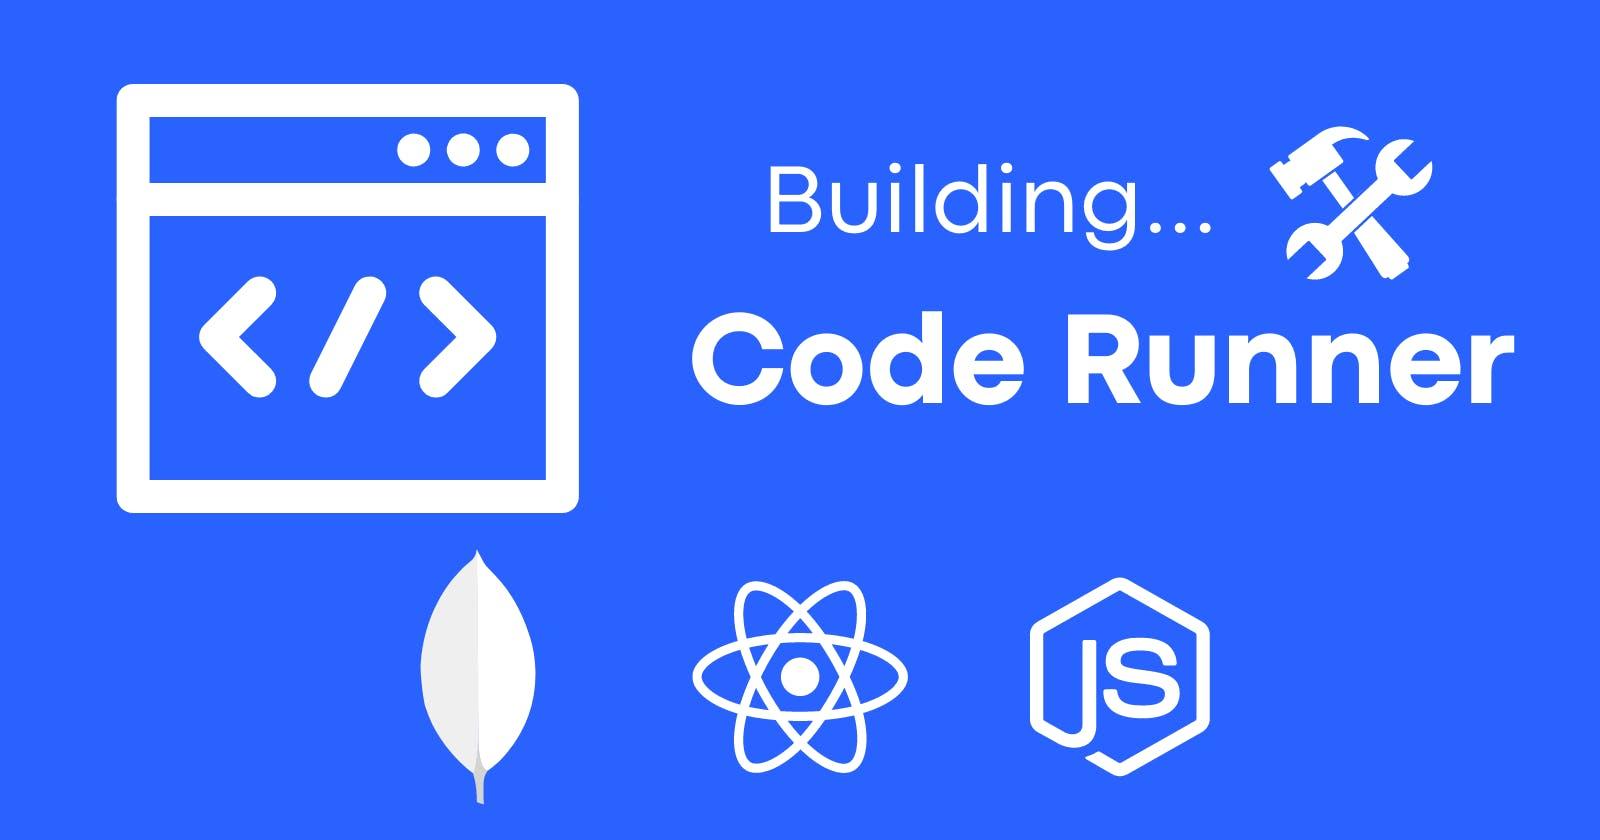 Building Code Runner - Part #0